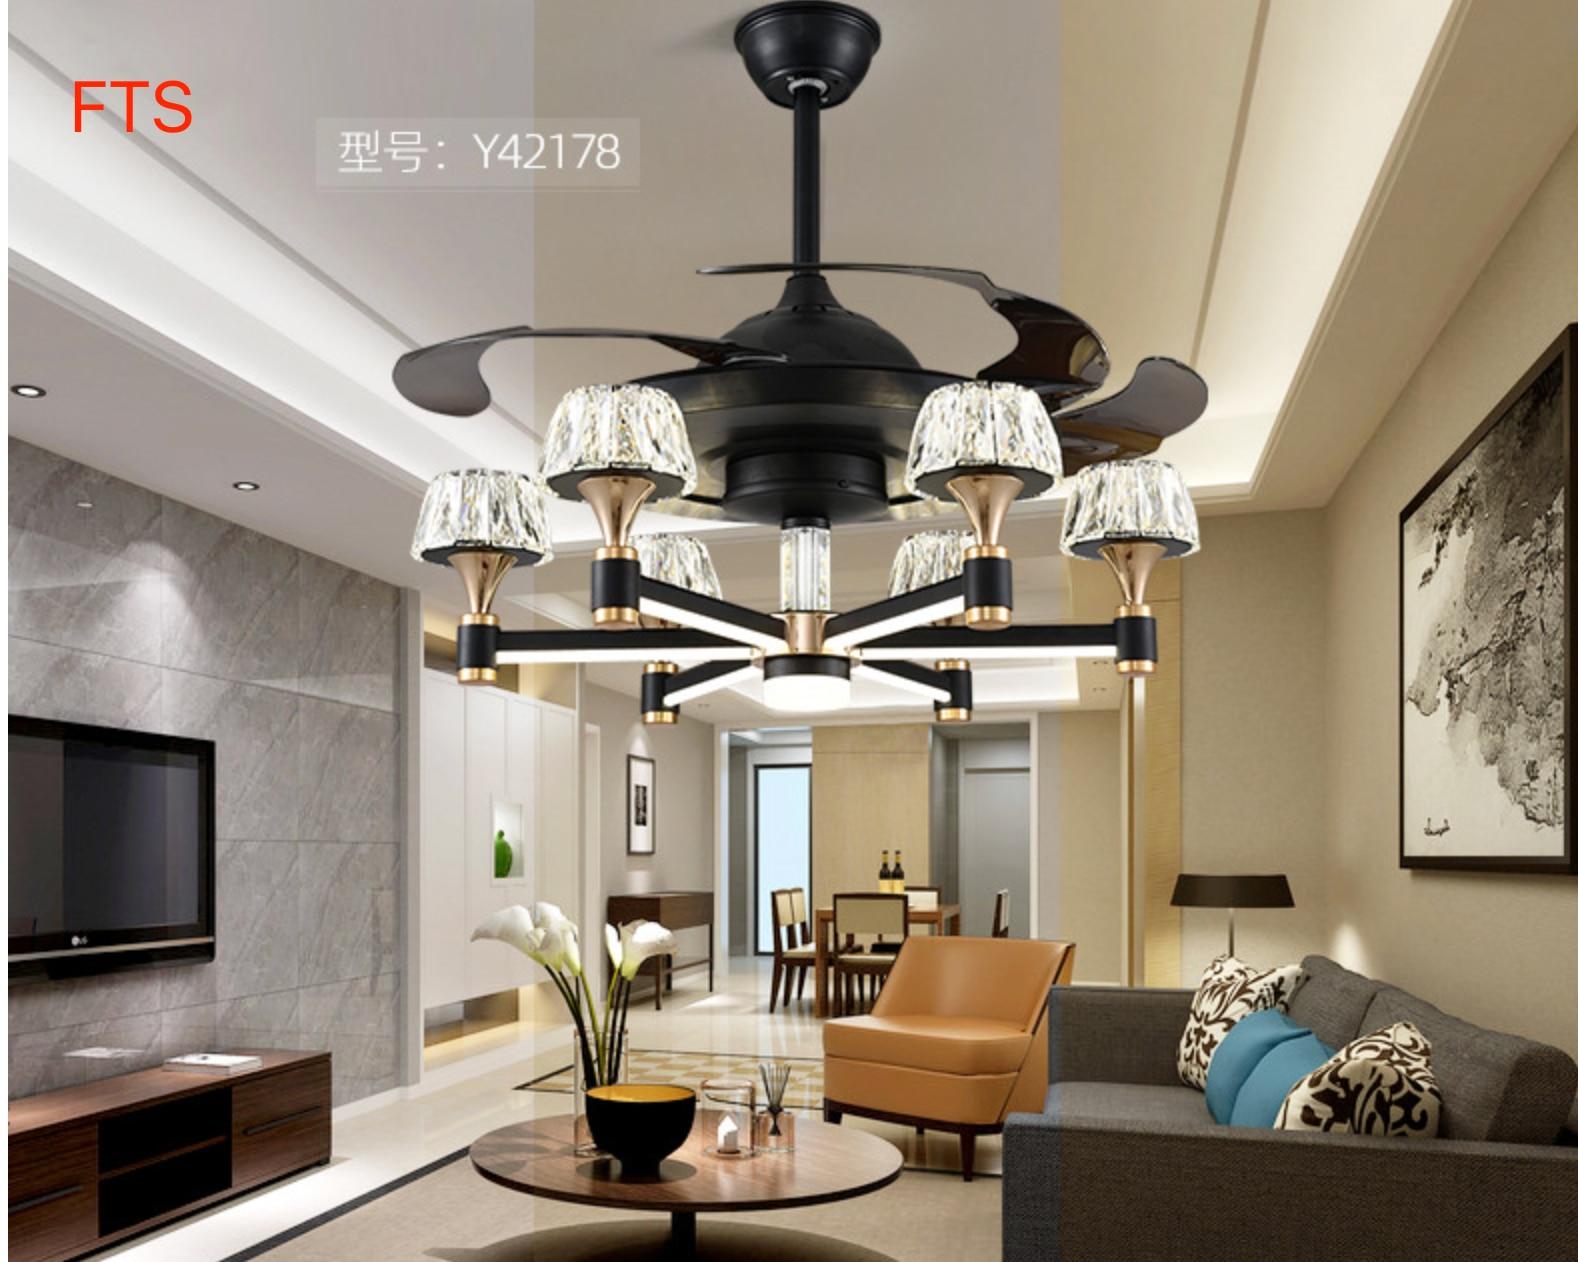 Fan Light   Invisible Chandelier Hotel Living Room Light Luxury Modern Simple Nordic Bedroom Fan Fan Chandelier Cheapest Price From Our Site